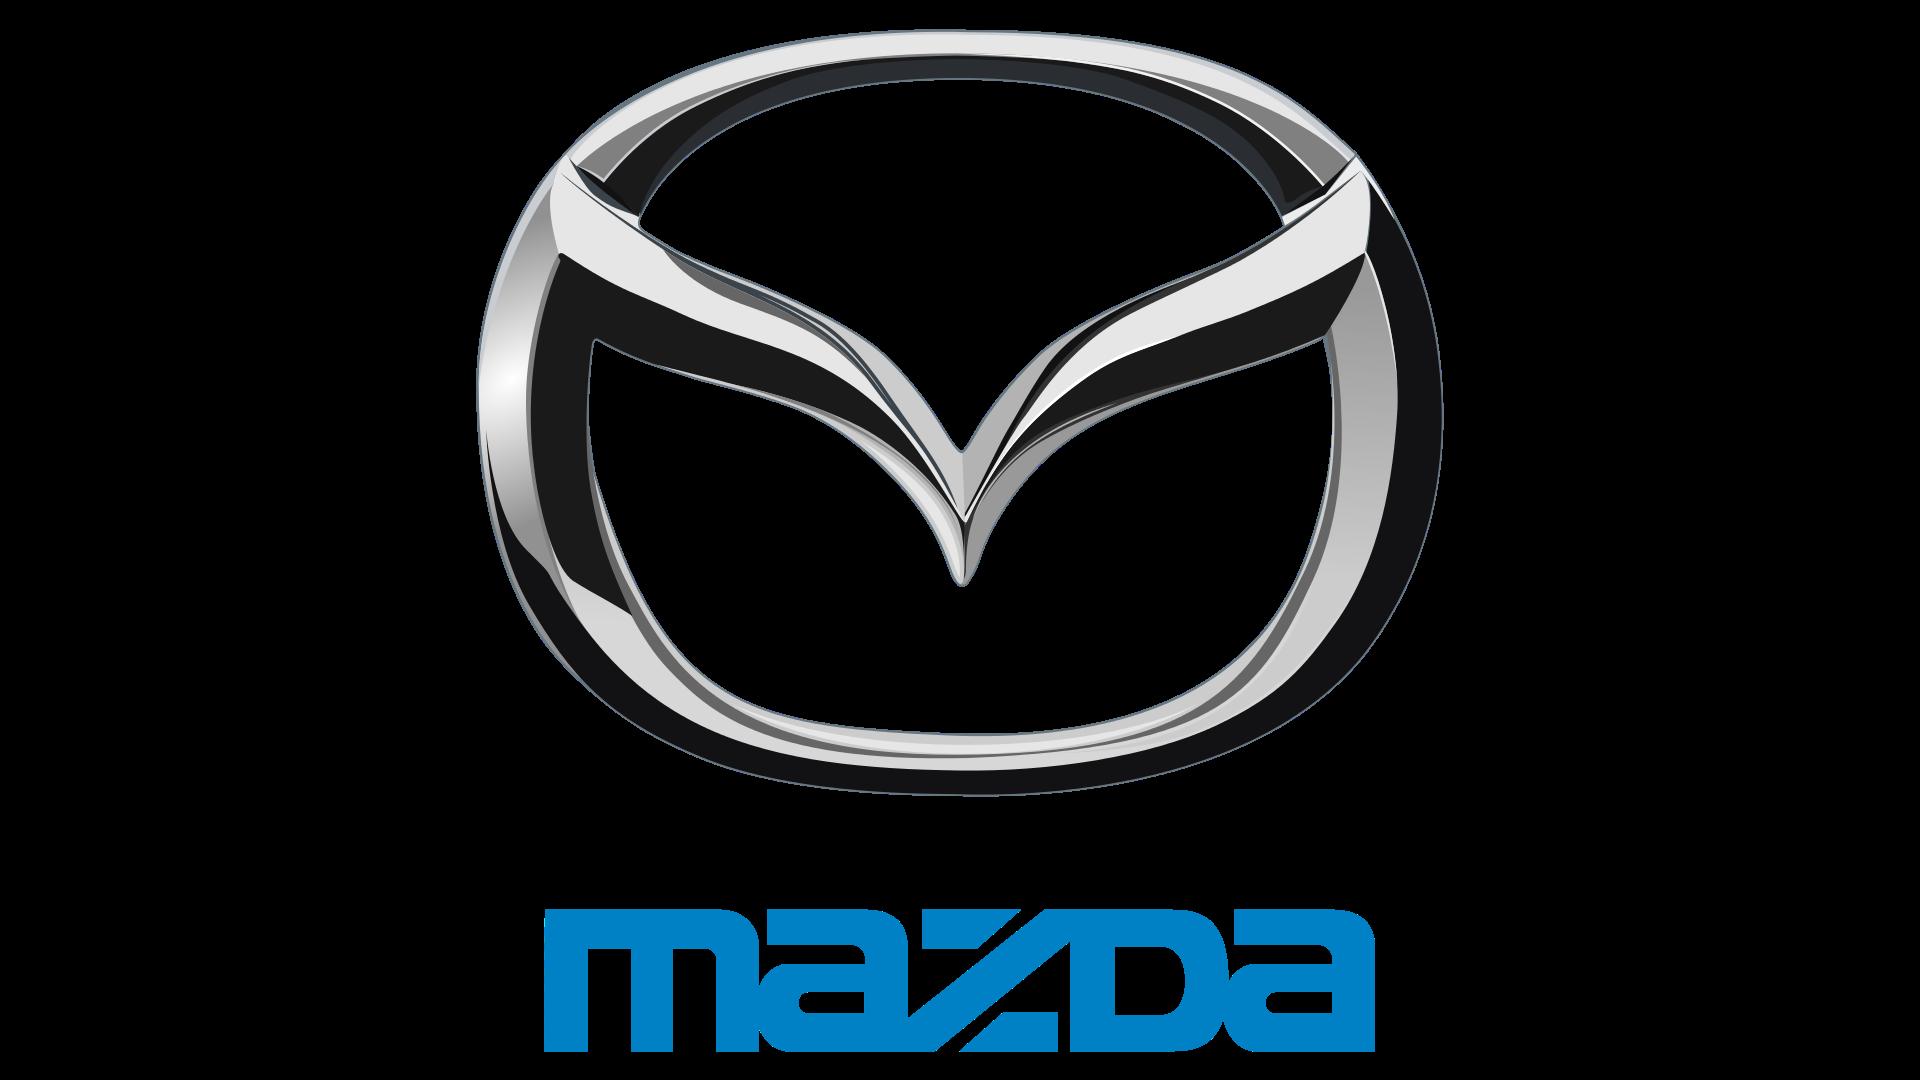 https://missglobal.com/wp-content/uploads/2018/05/Mazda-logo-1997-1920x1080.png